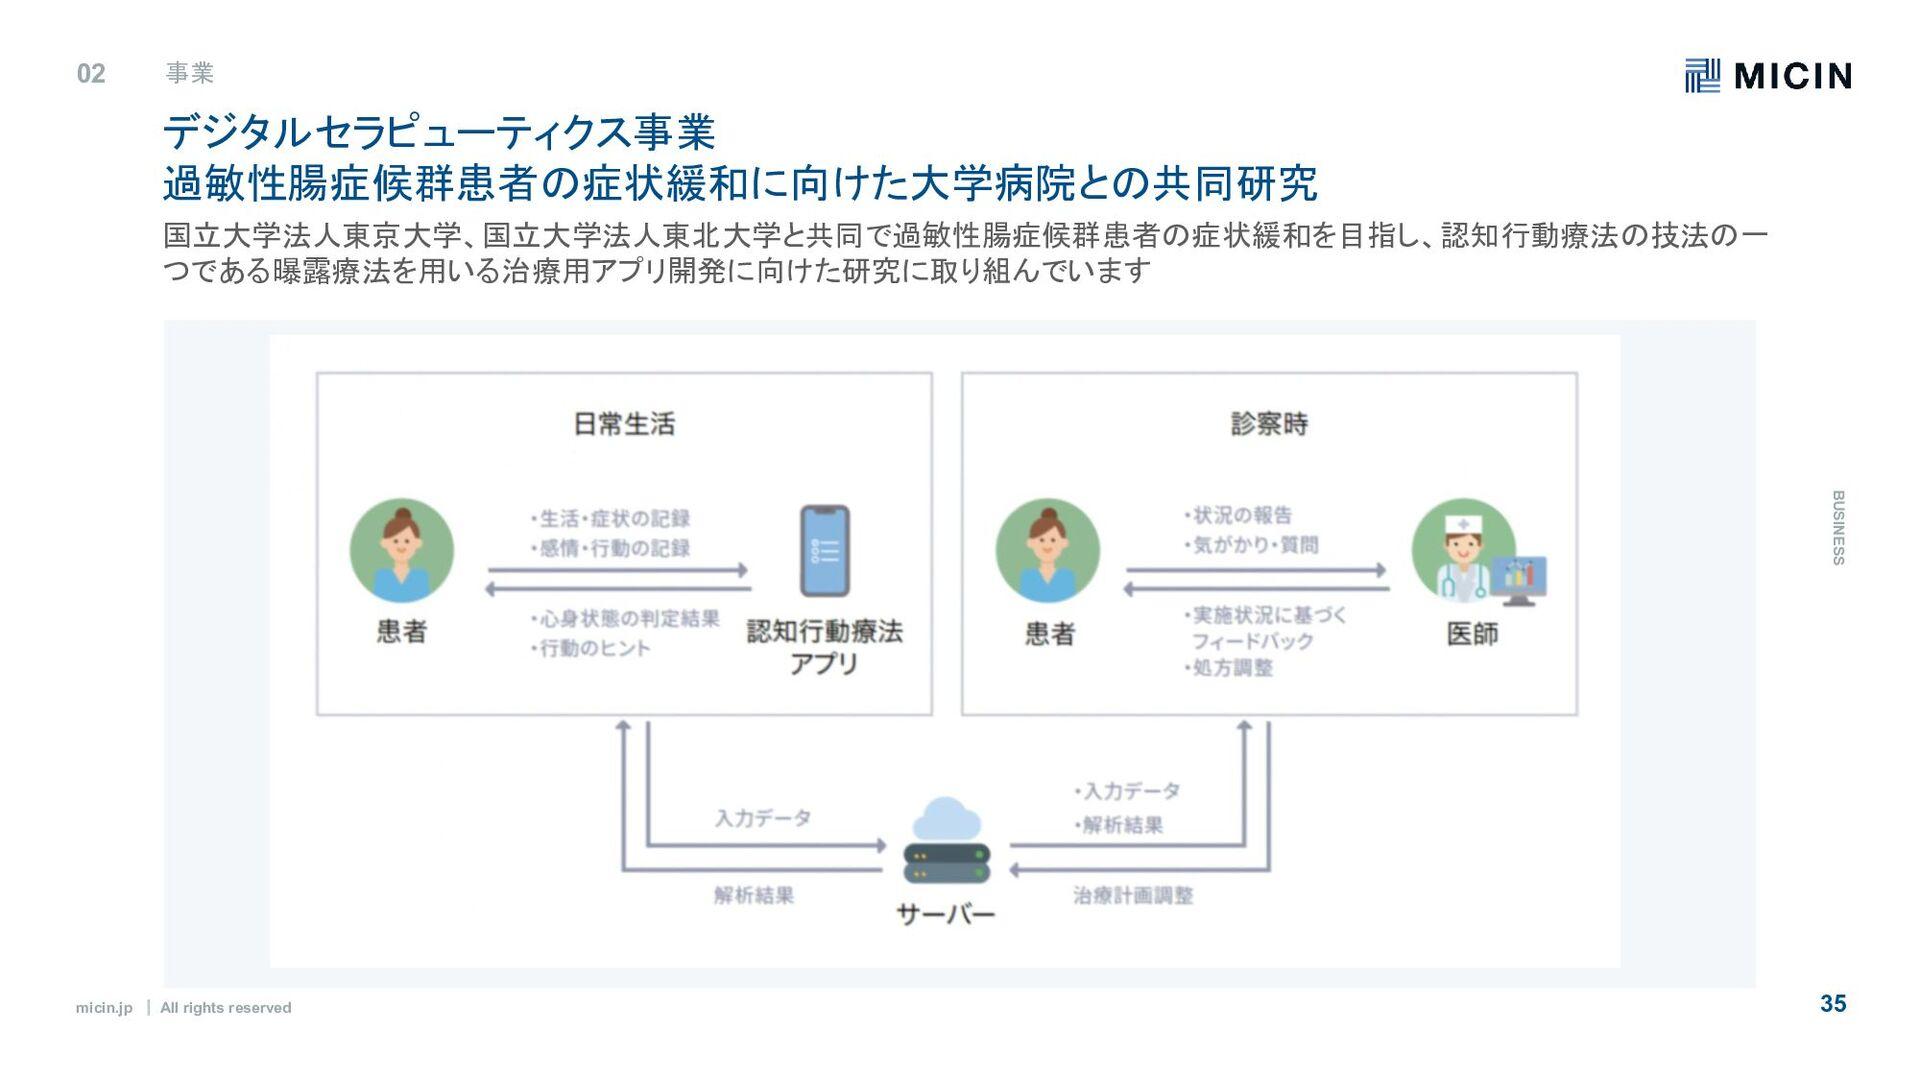 micin.jp ʛ All rights reserved 35 ϝϯόʔհ 03 Y.T...